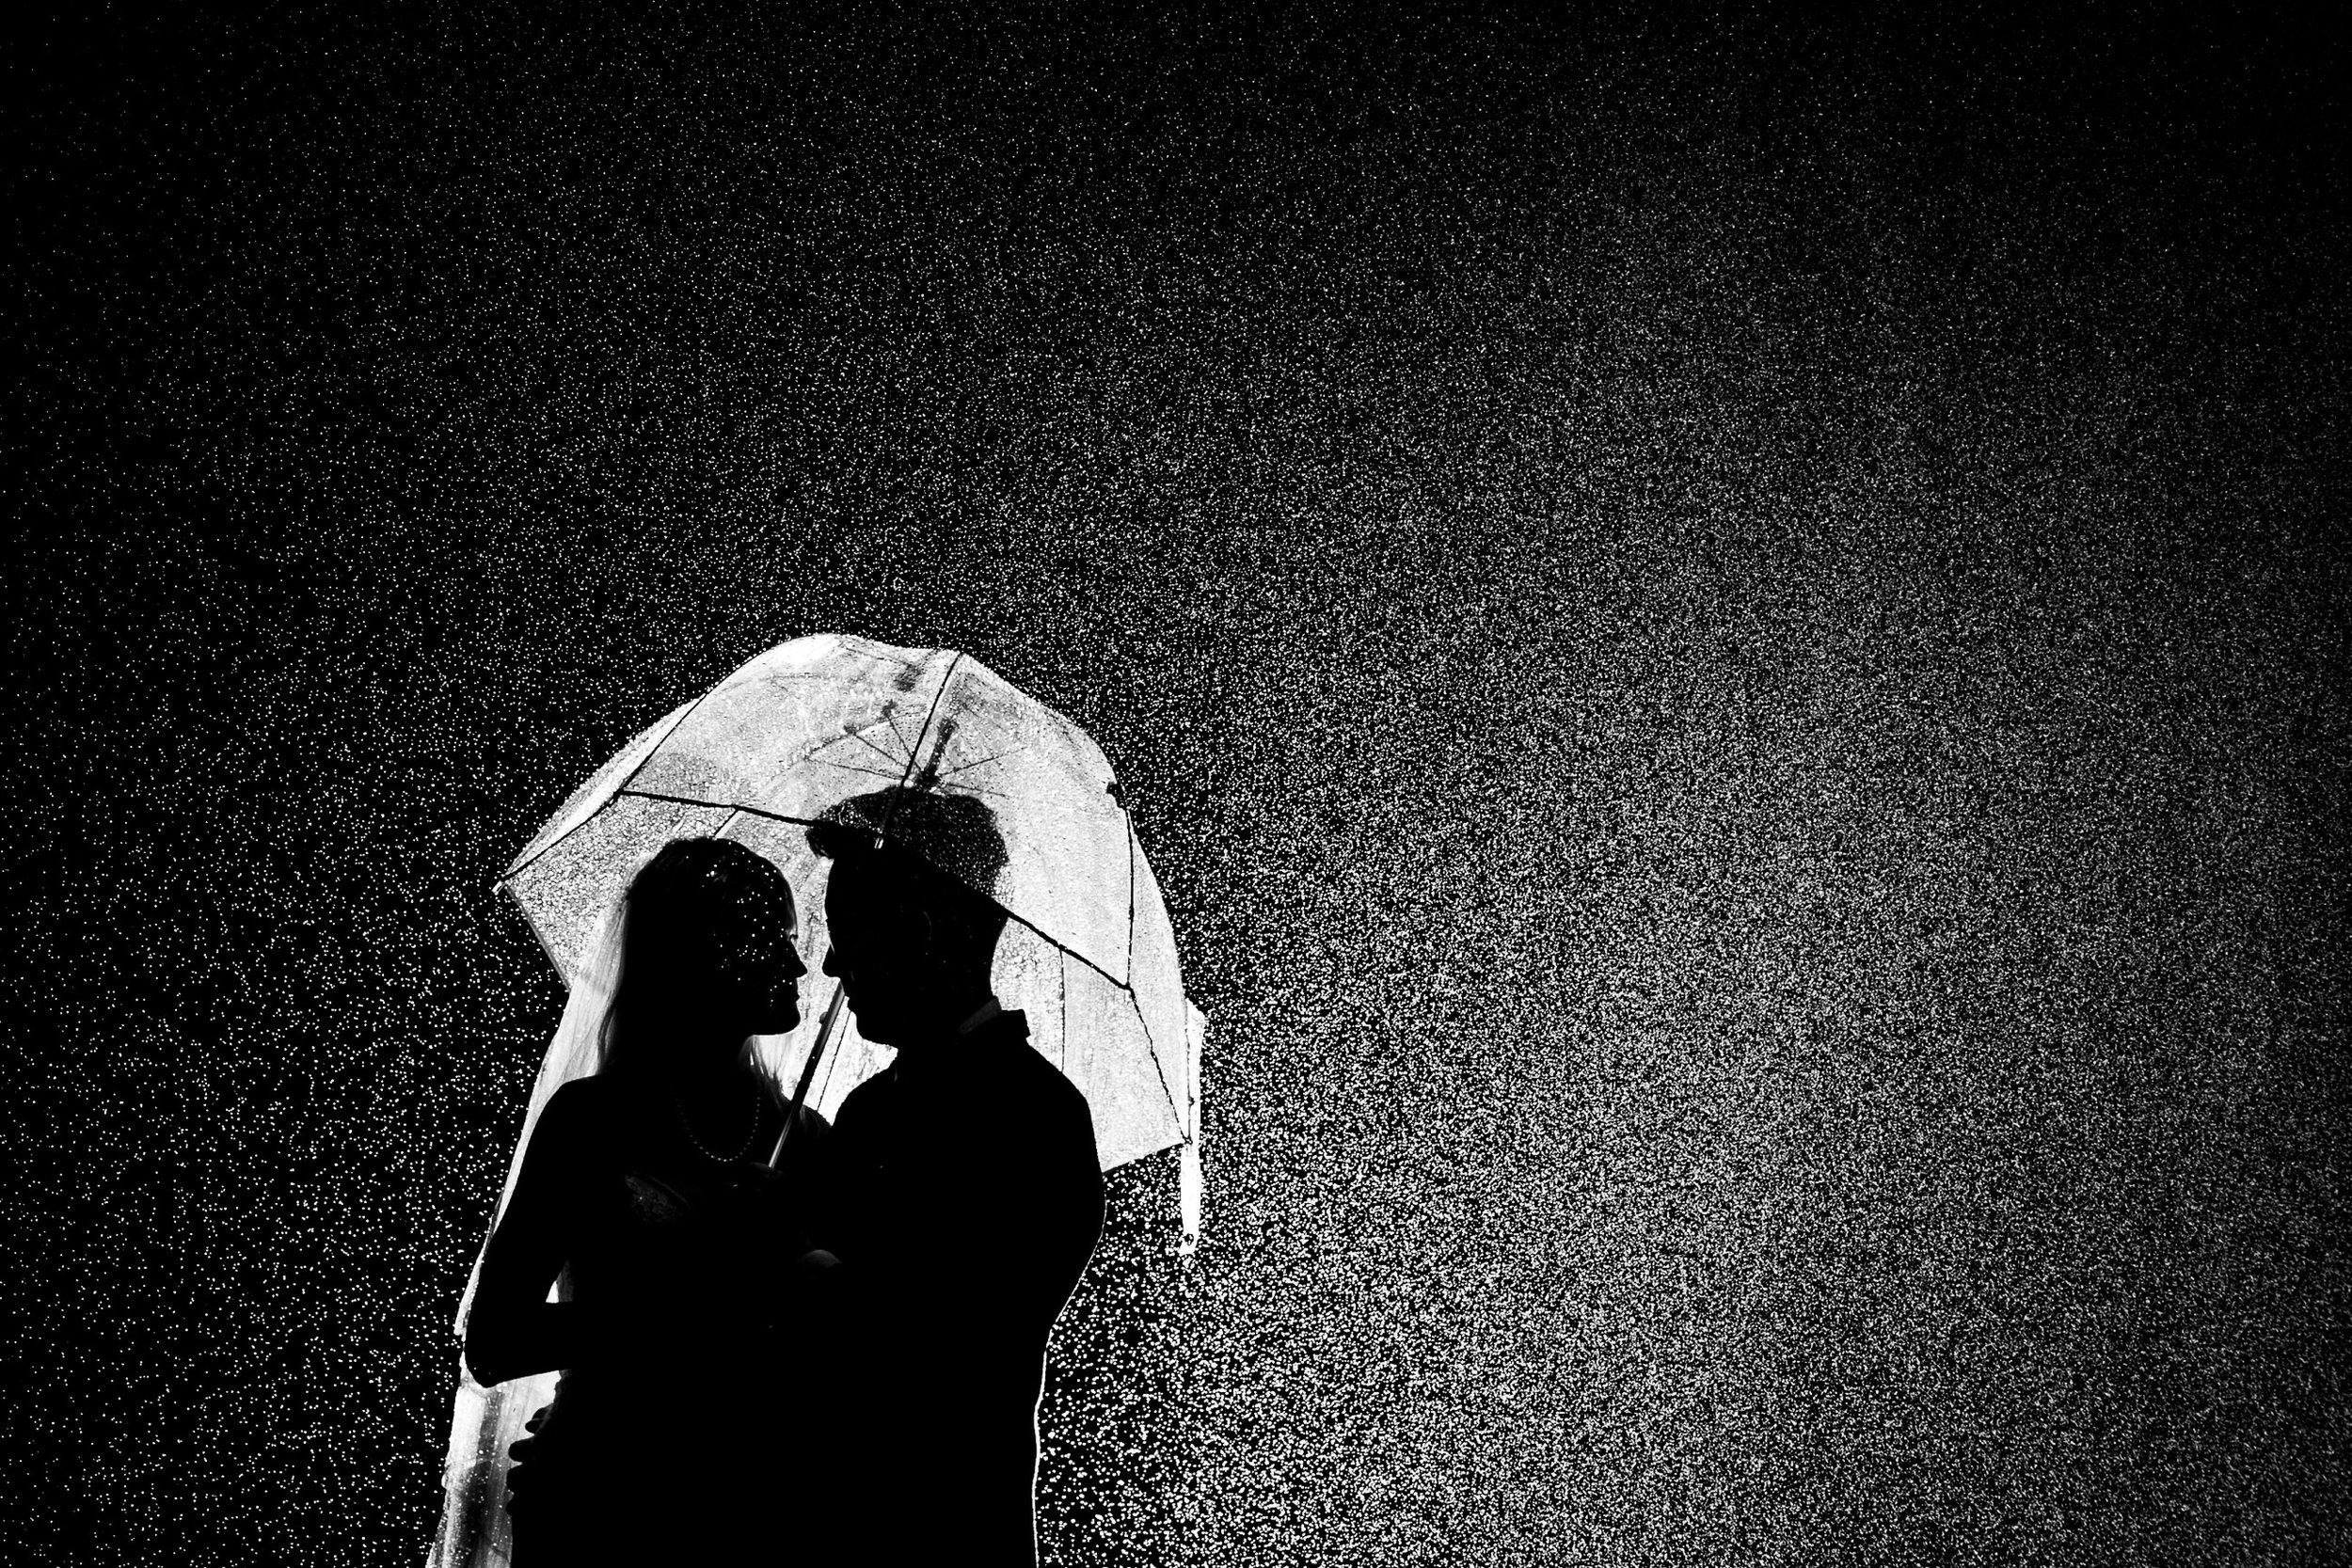 Bride and Groom Rain Umbrella-1.jpg